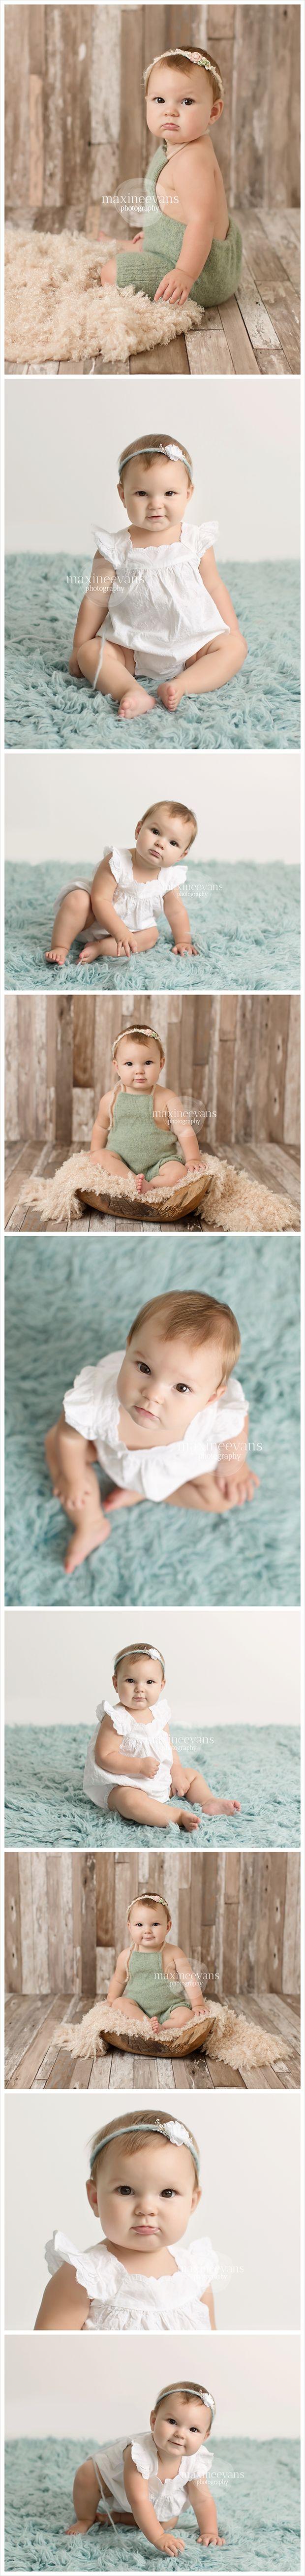 Los Angeles - Westlake Village Baby Photography #milestone #sitter www.maxineevansphotography.com